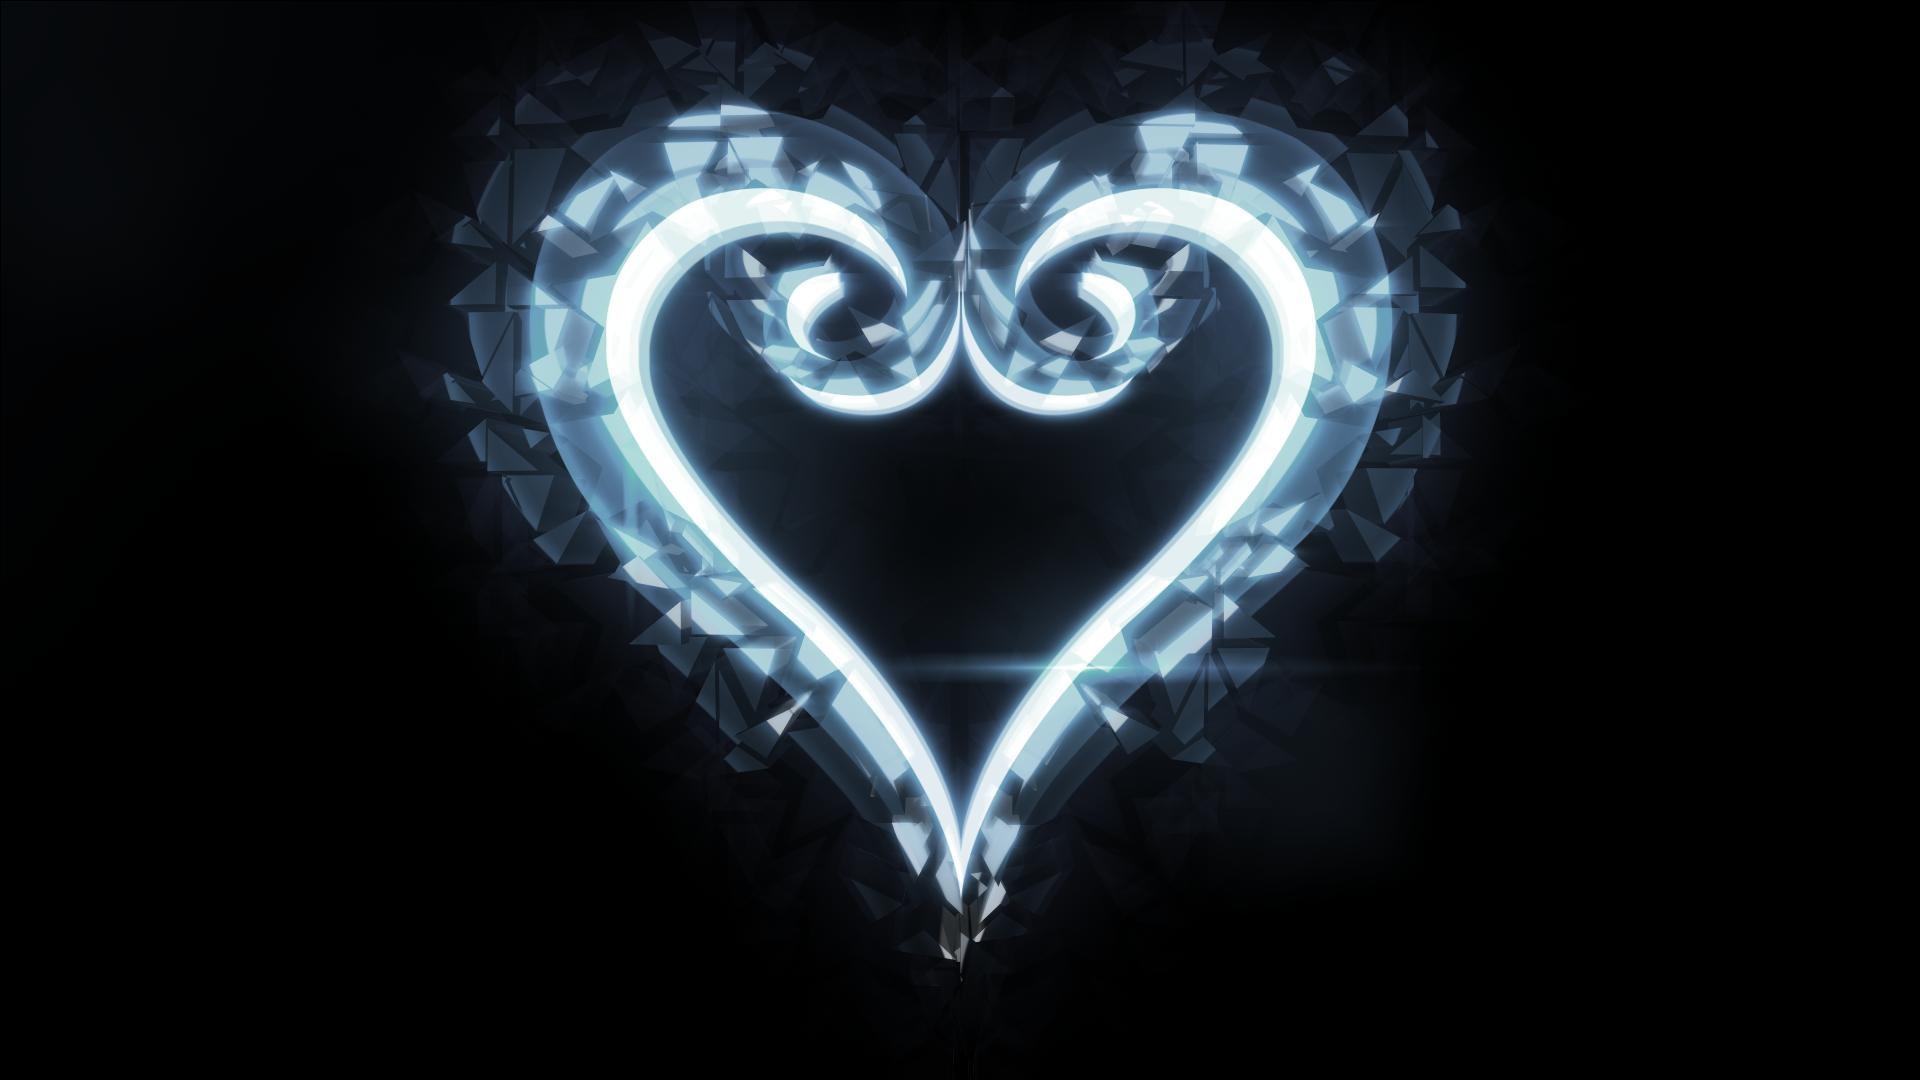 Kingdom Heart Wallpaper Hd